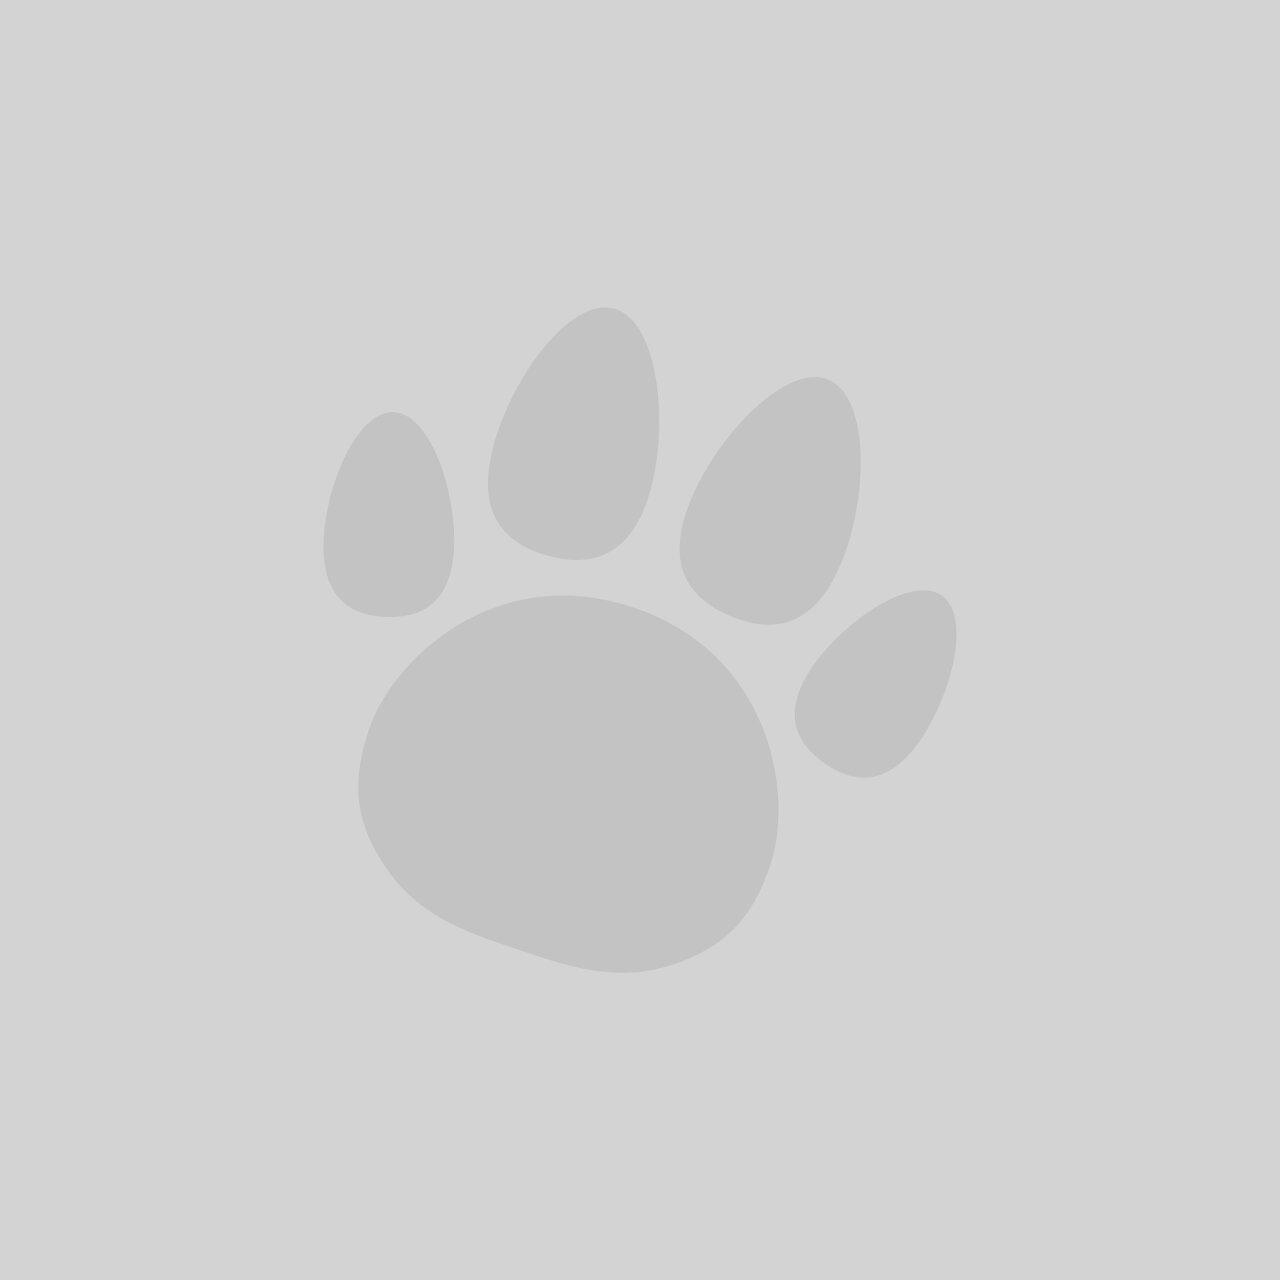 TastyBone Lamb Nylon Trio Bone for Large Dogs